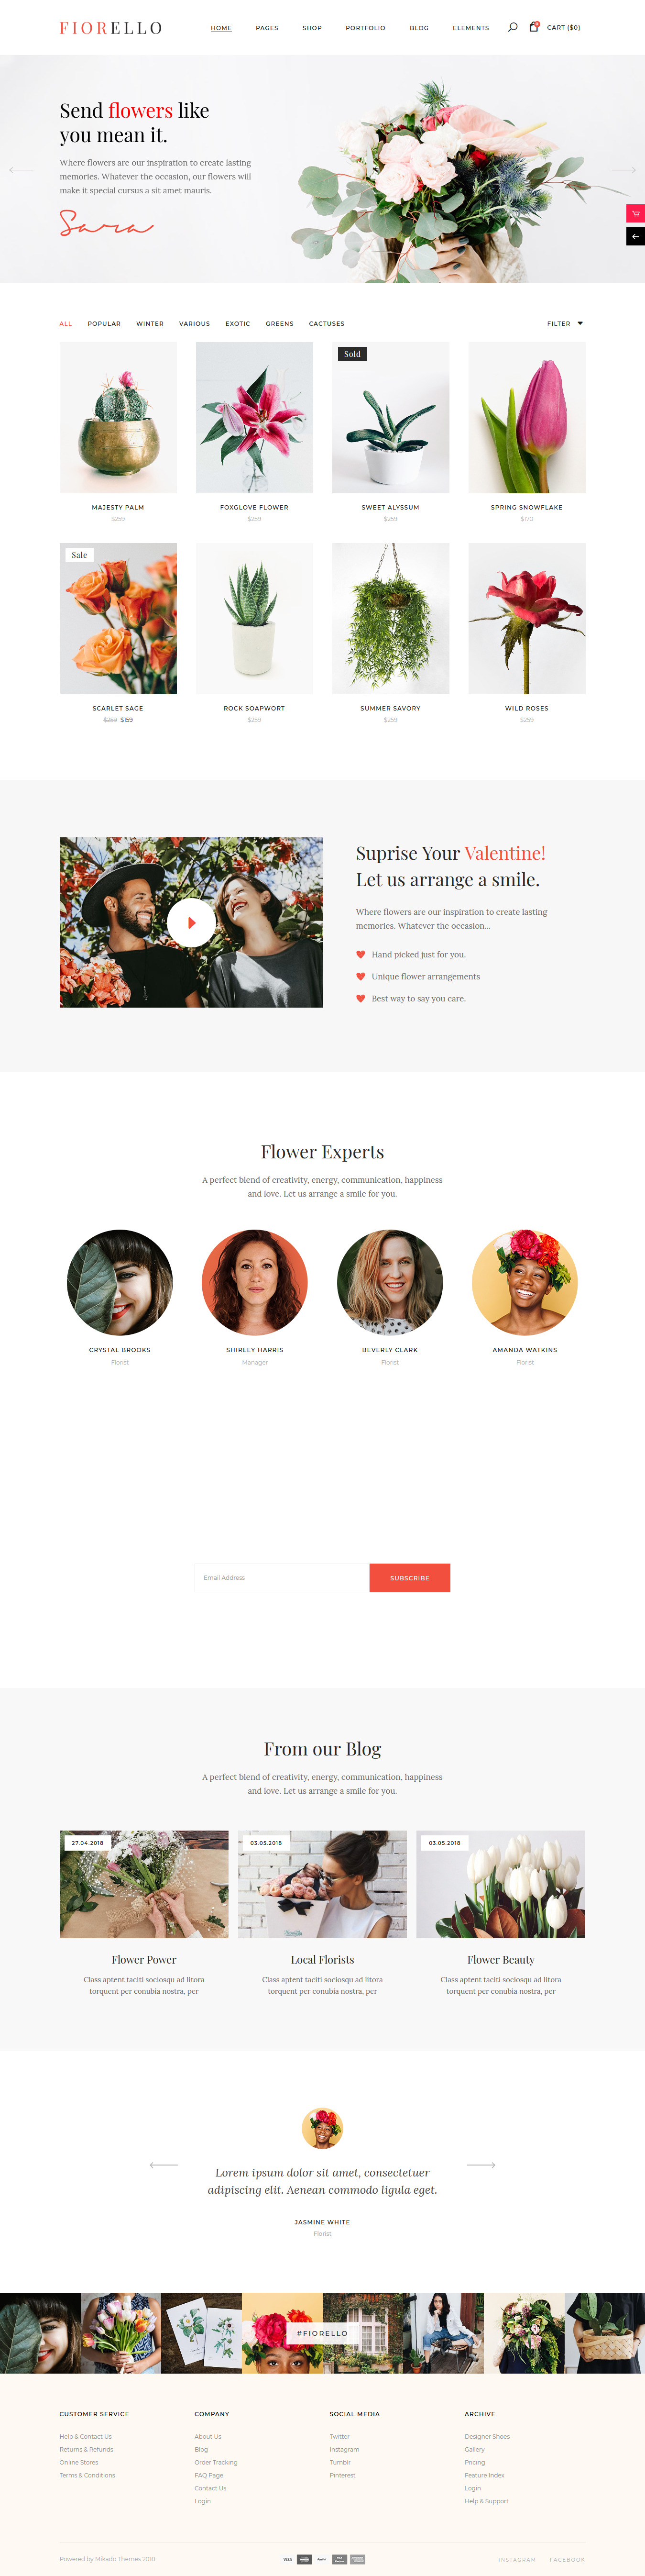 Fiorello – Best Premium Florist and Floriculture WordPress Theme